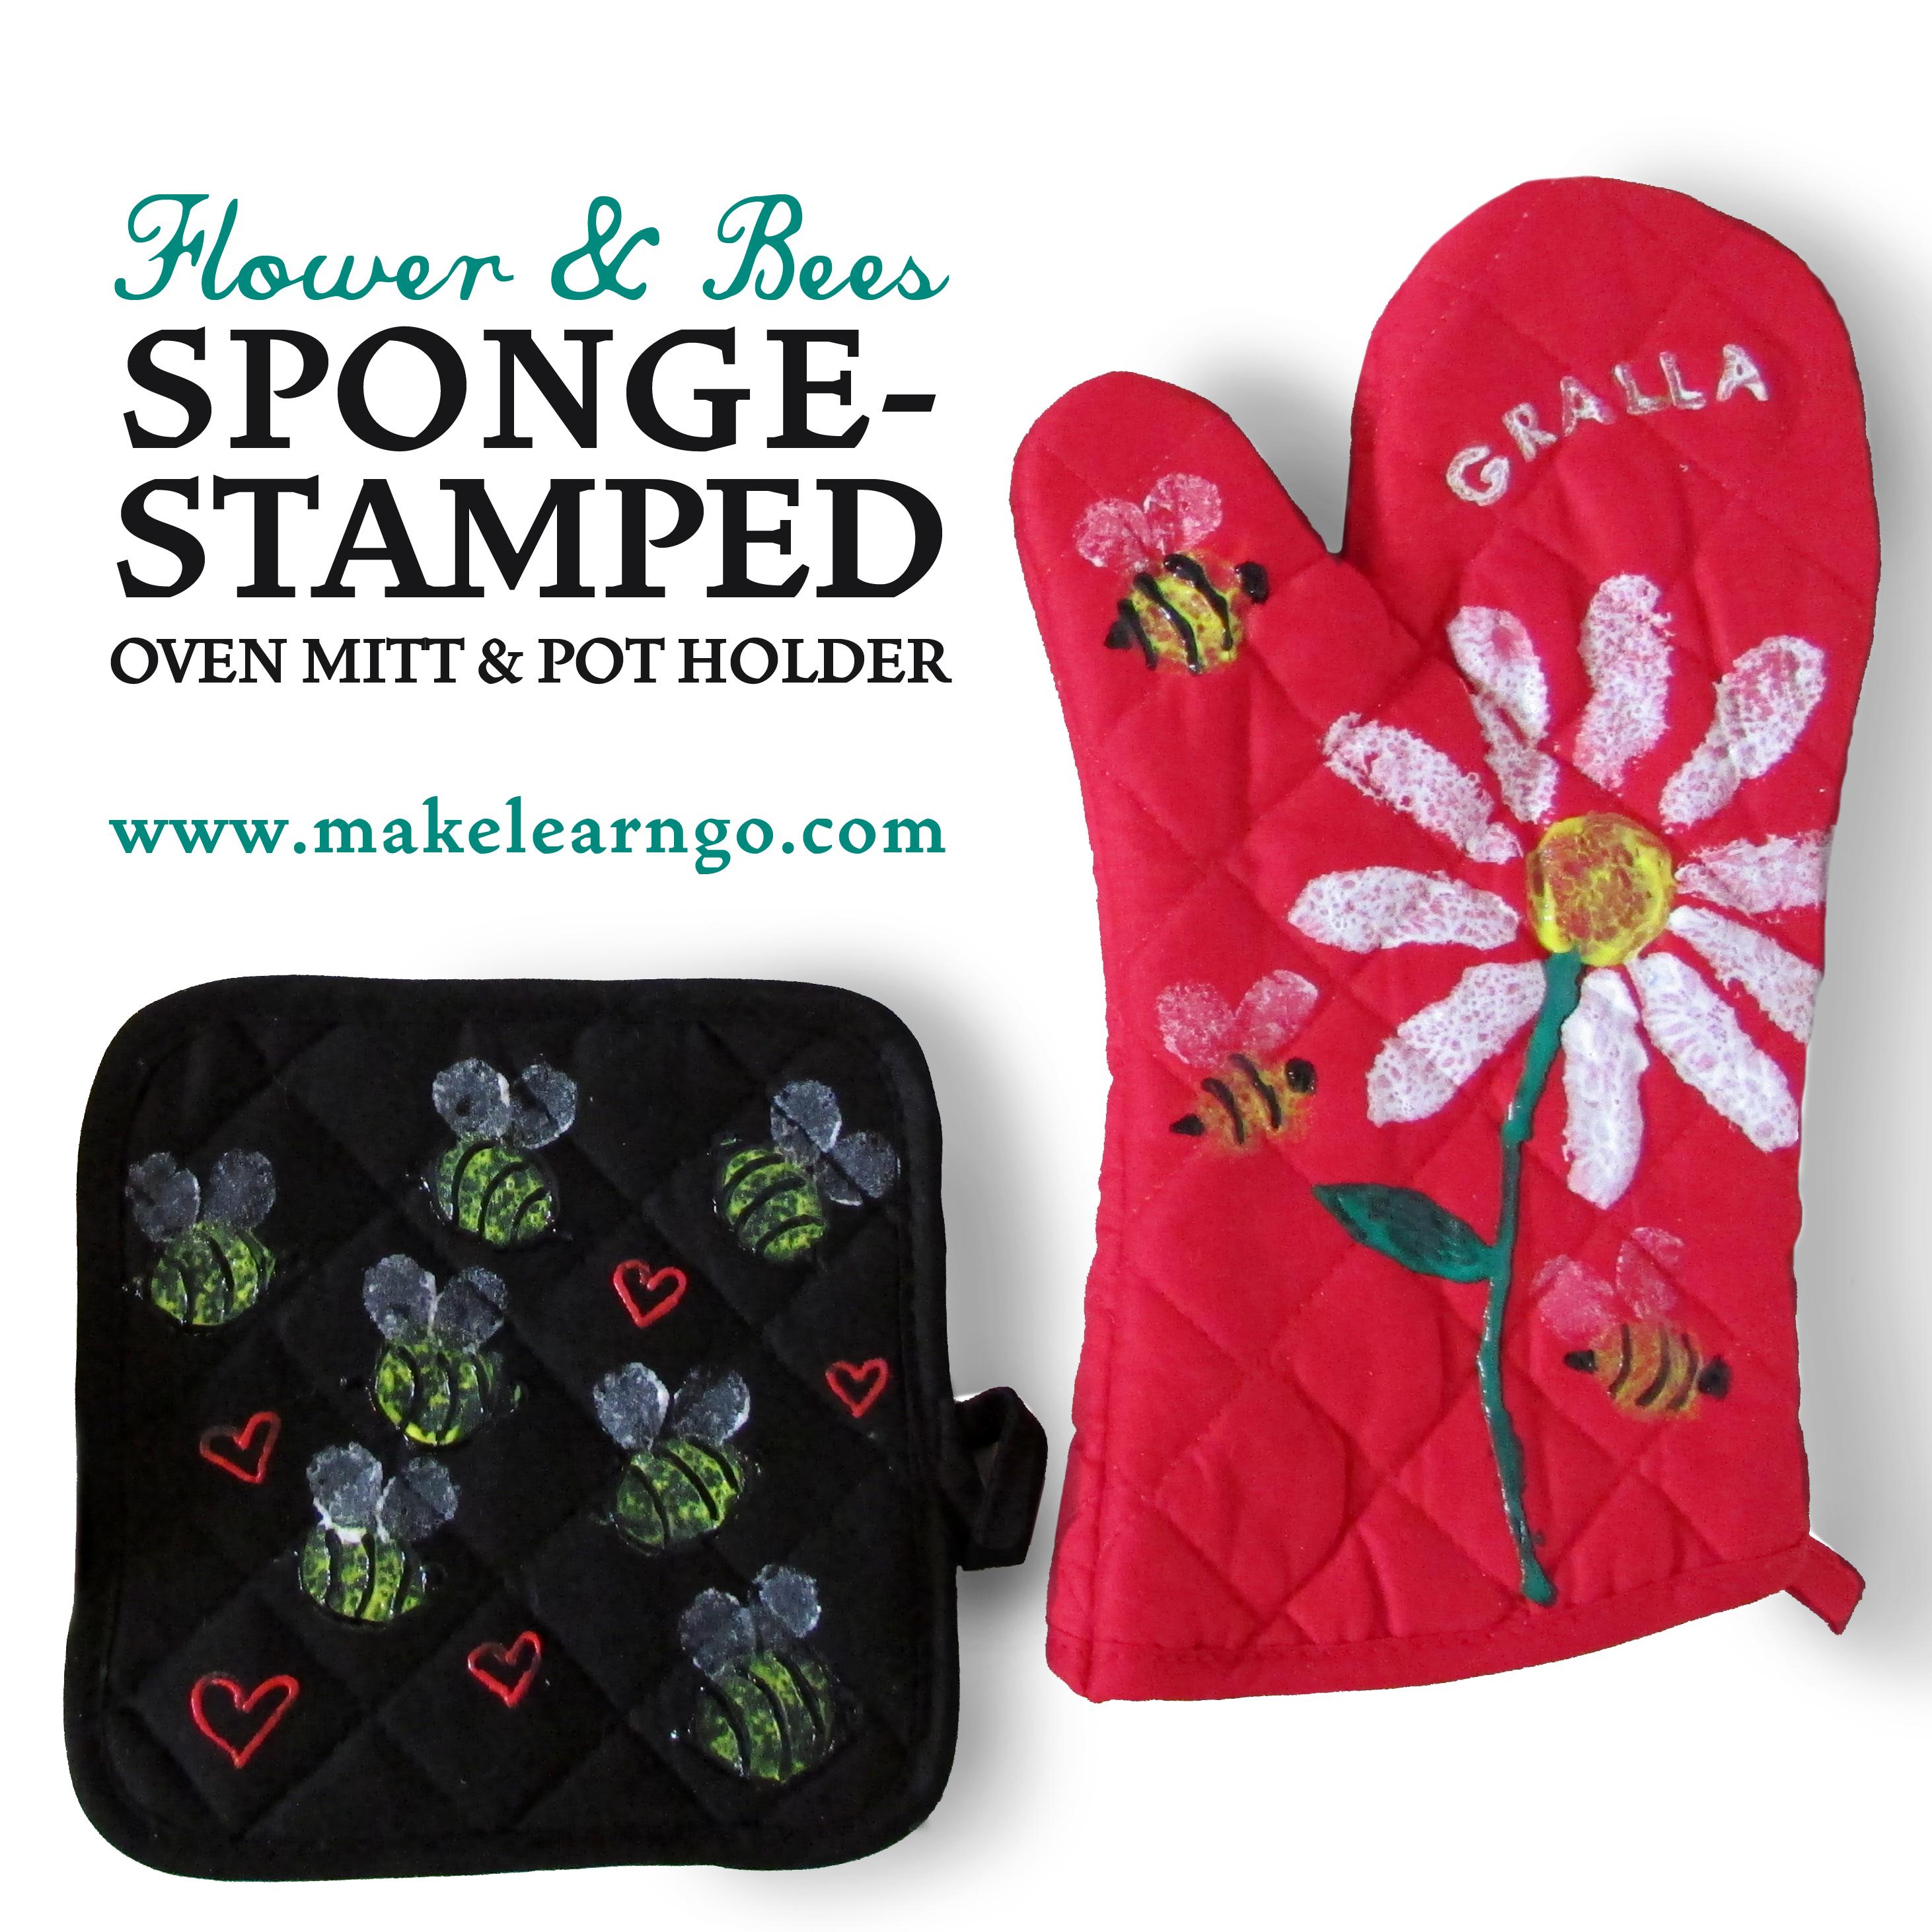 Flower bees sponge stamped oven mitt pot holder